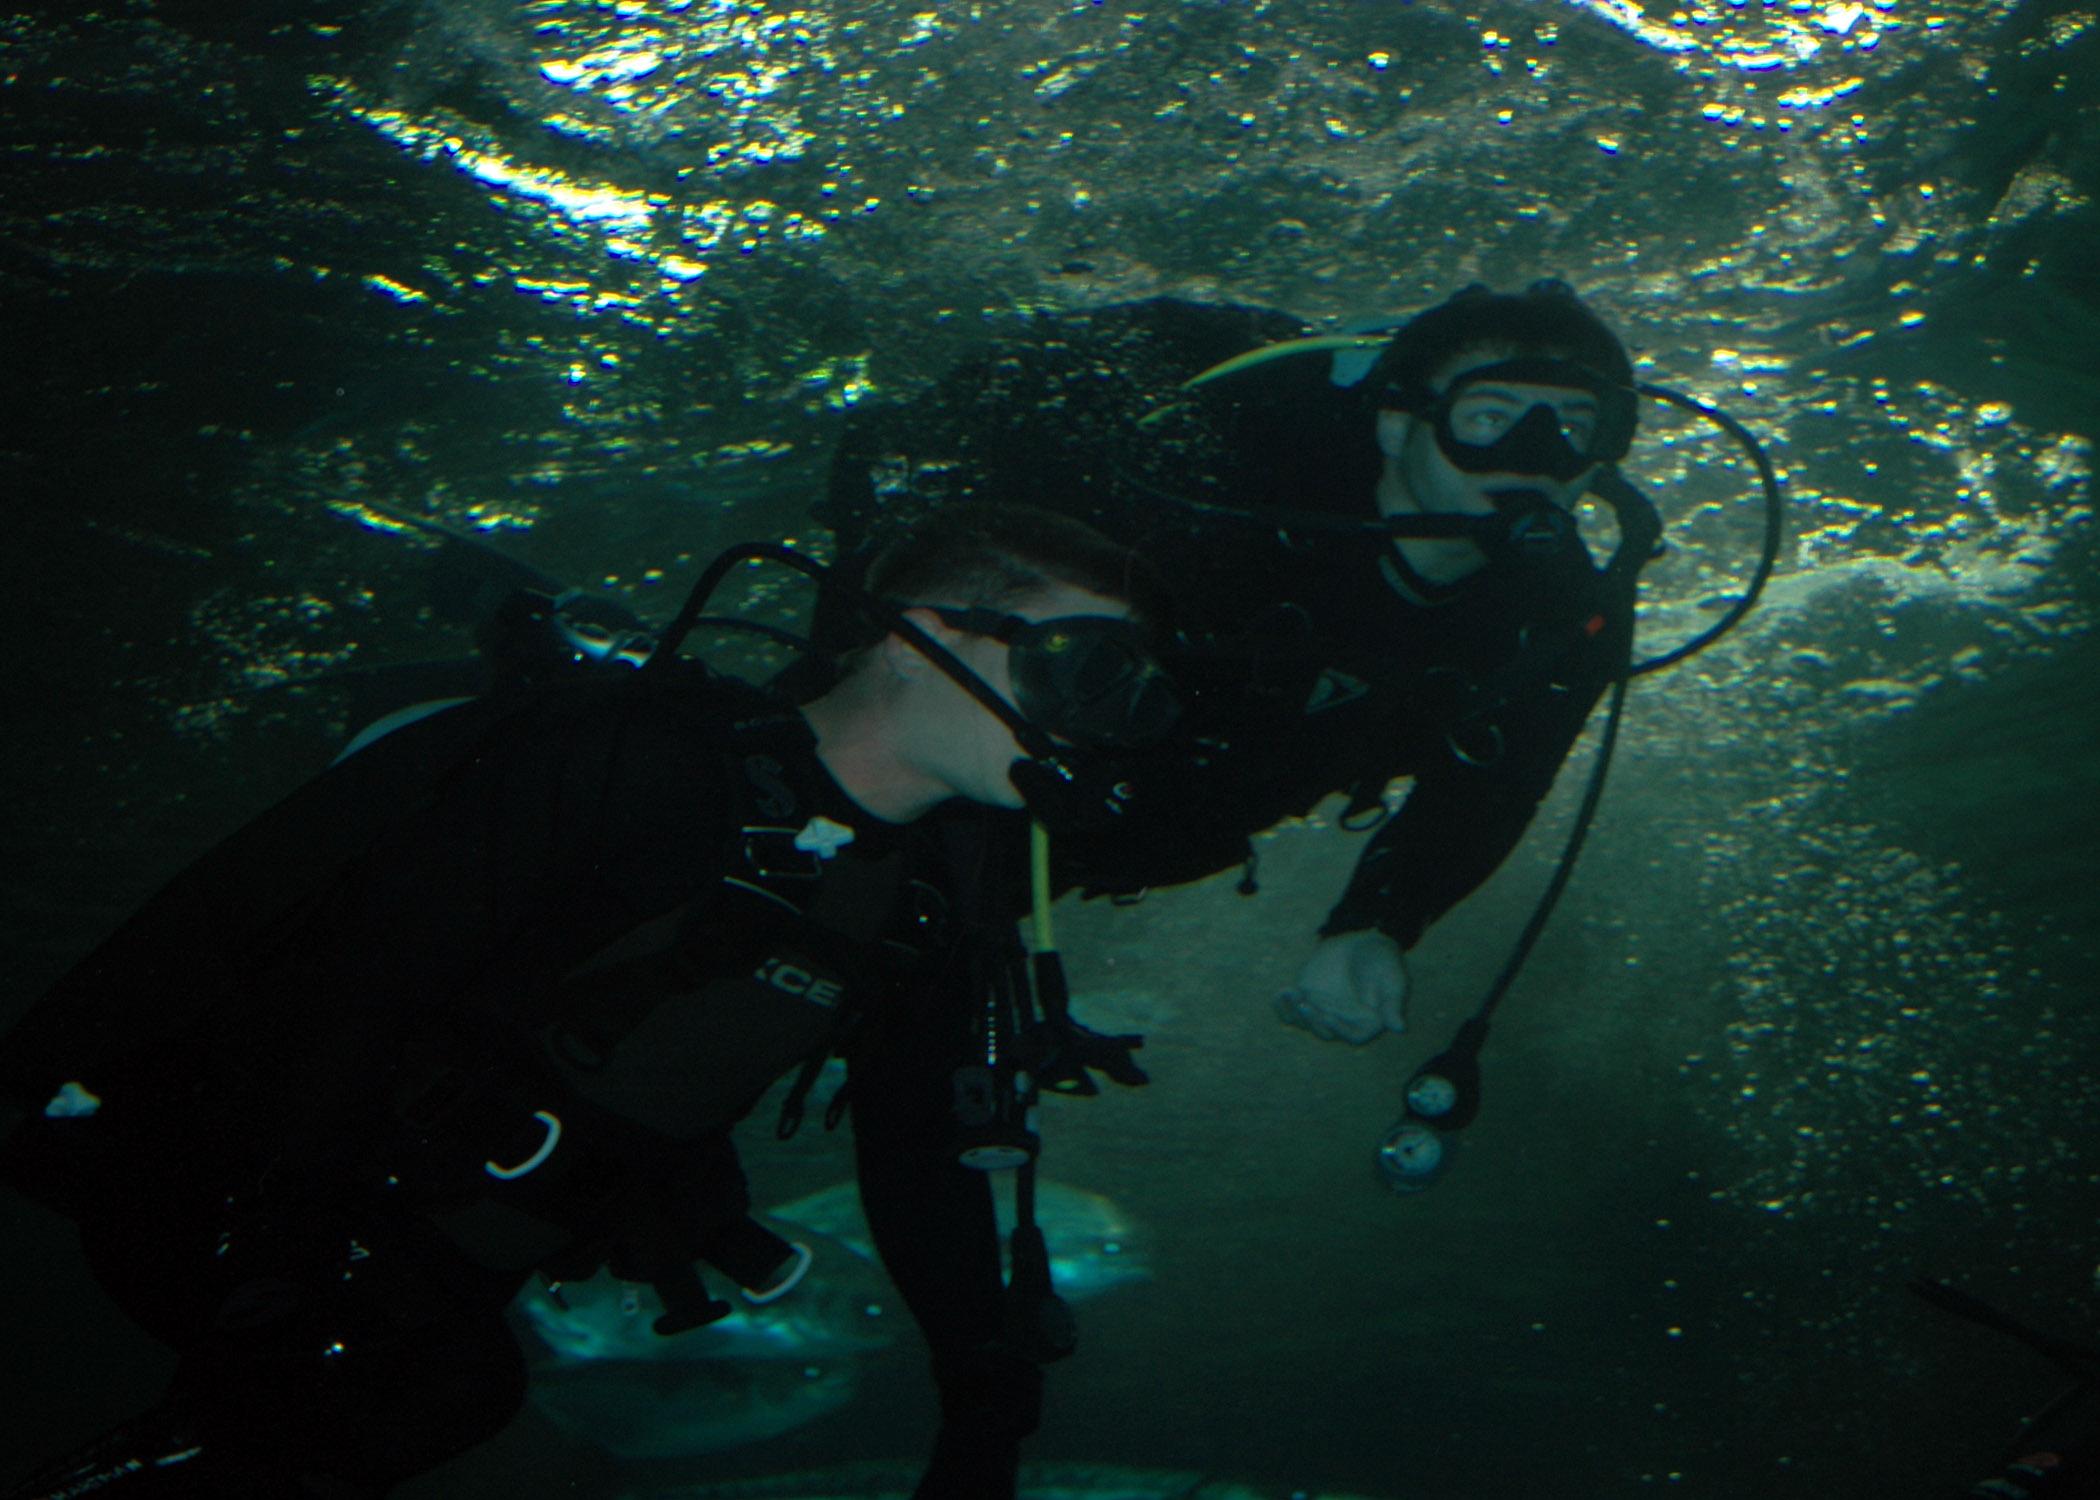 St Class Aquarium Staten Island Ny